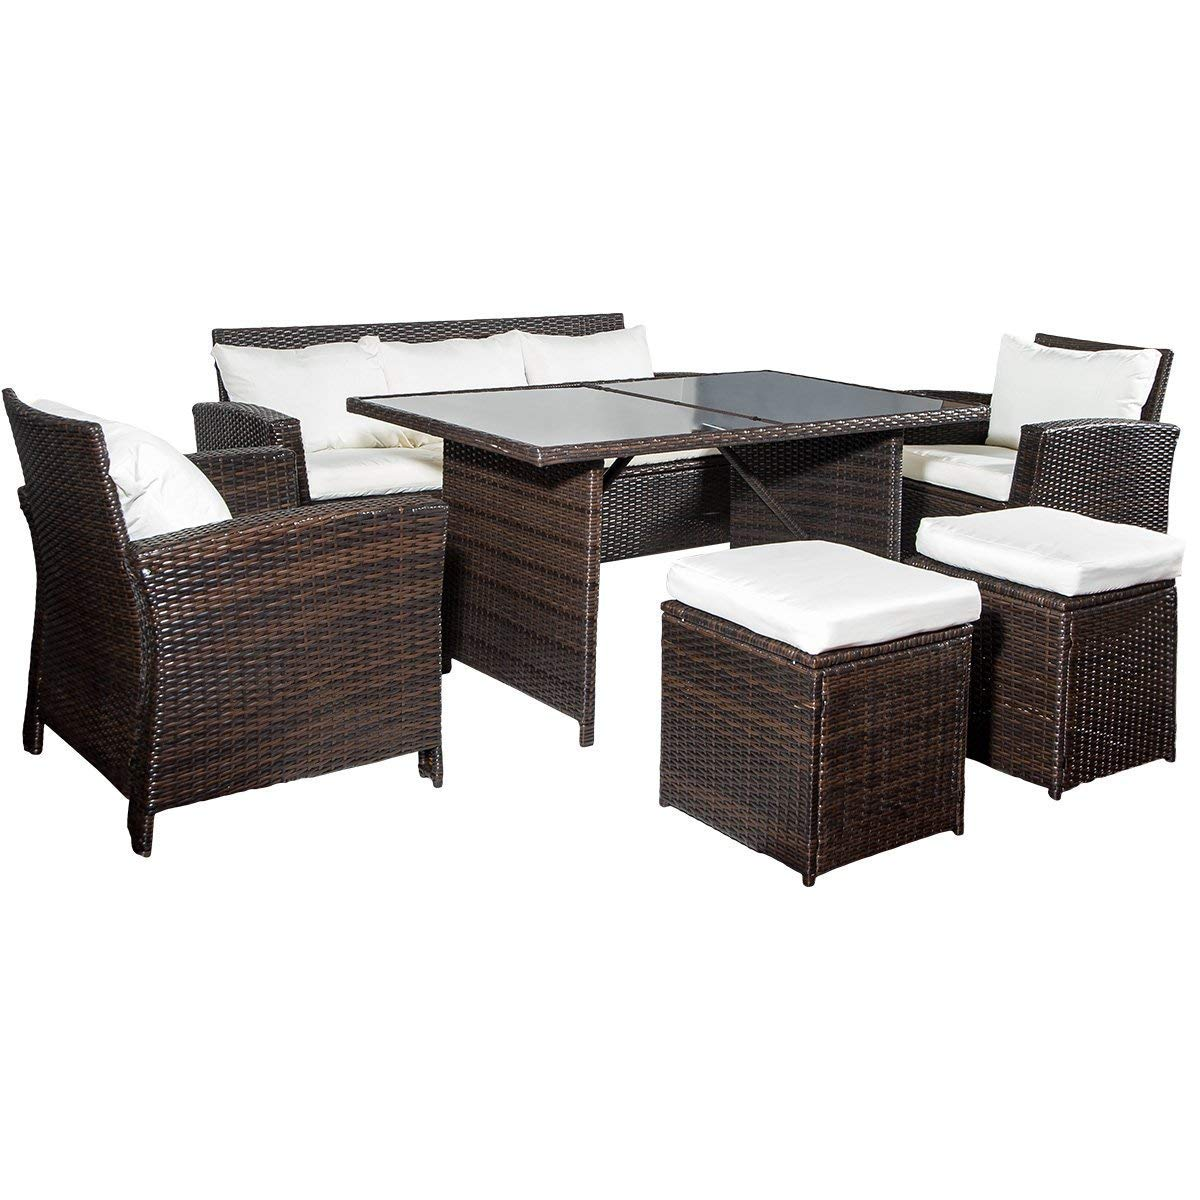 Merax 6-Piece Patio Furniture Dining Set Outdoor Living Wicker Sofa Set (Beige Cushion)